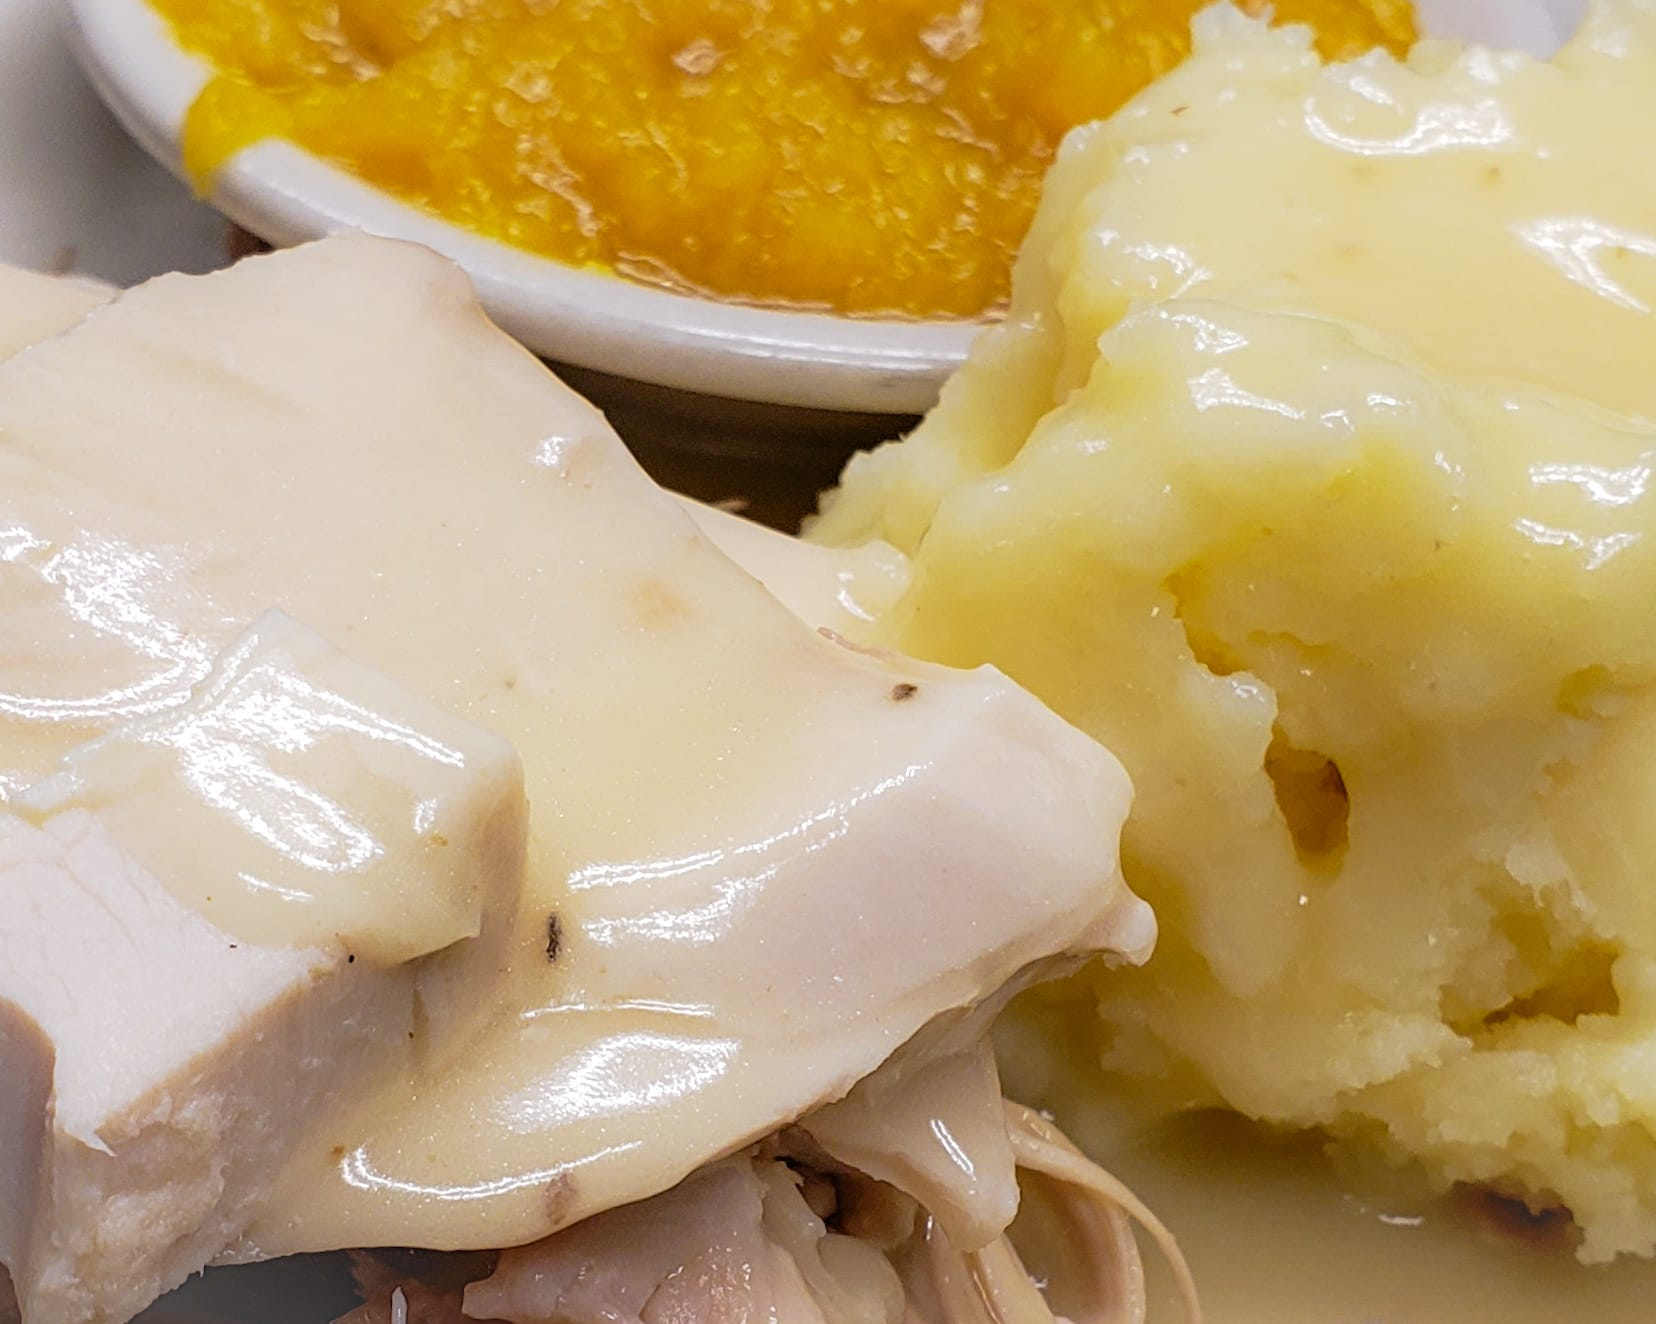 Today's Special: Turkey Dinner